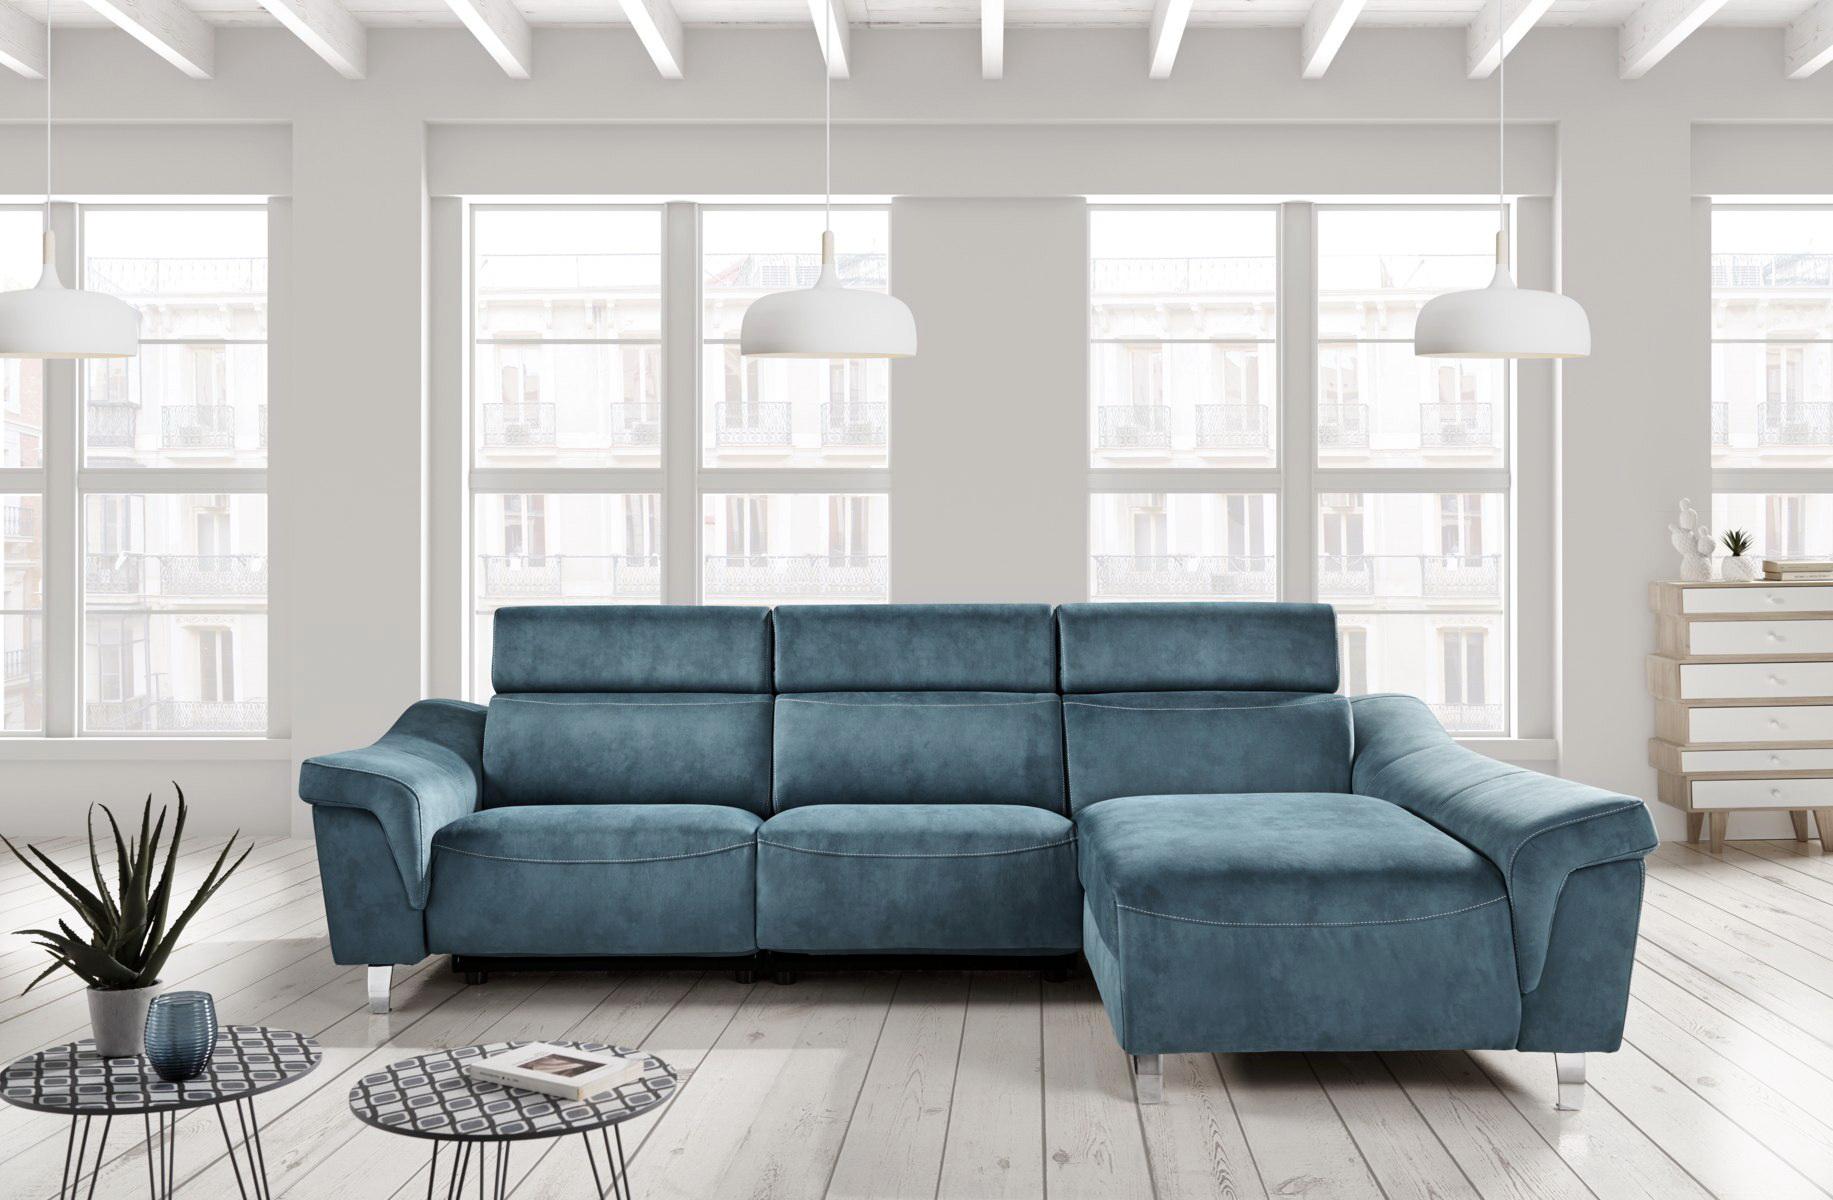 Sofá chaise-longue relax motorizado ALASKA 2 by Future Design Confort en muebles antoñán® León